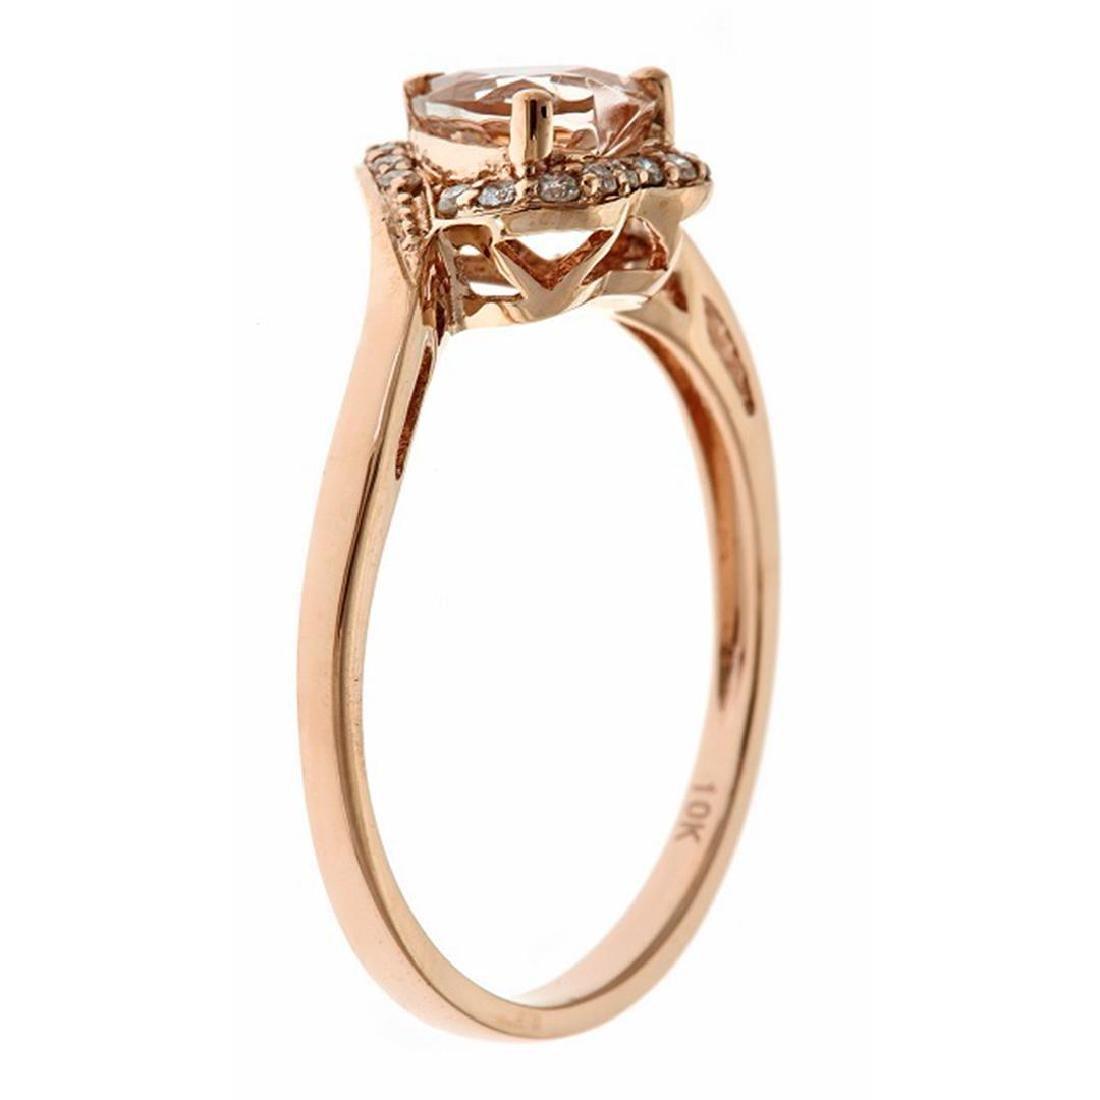 0.68 ctw Morganite and Diamond Ring - 10KT Rose Gold - 2